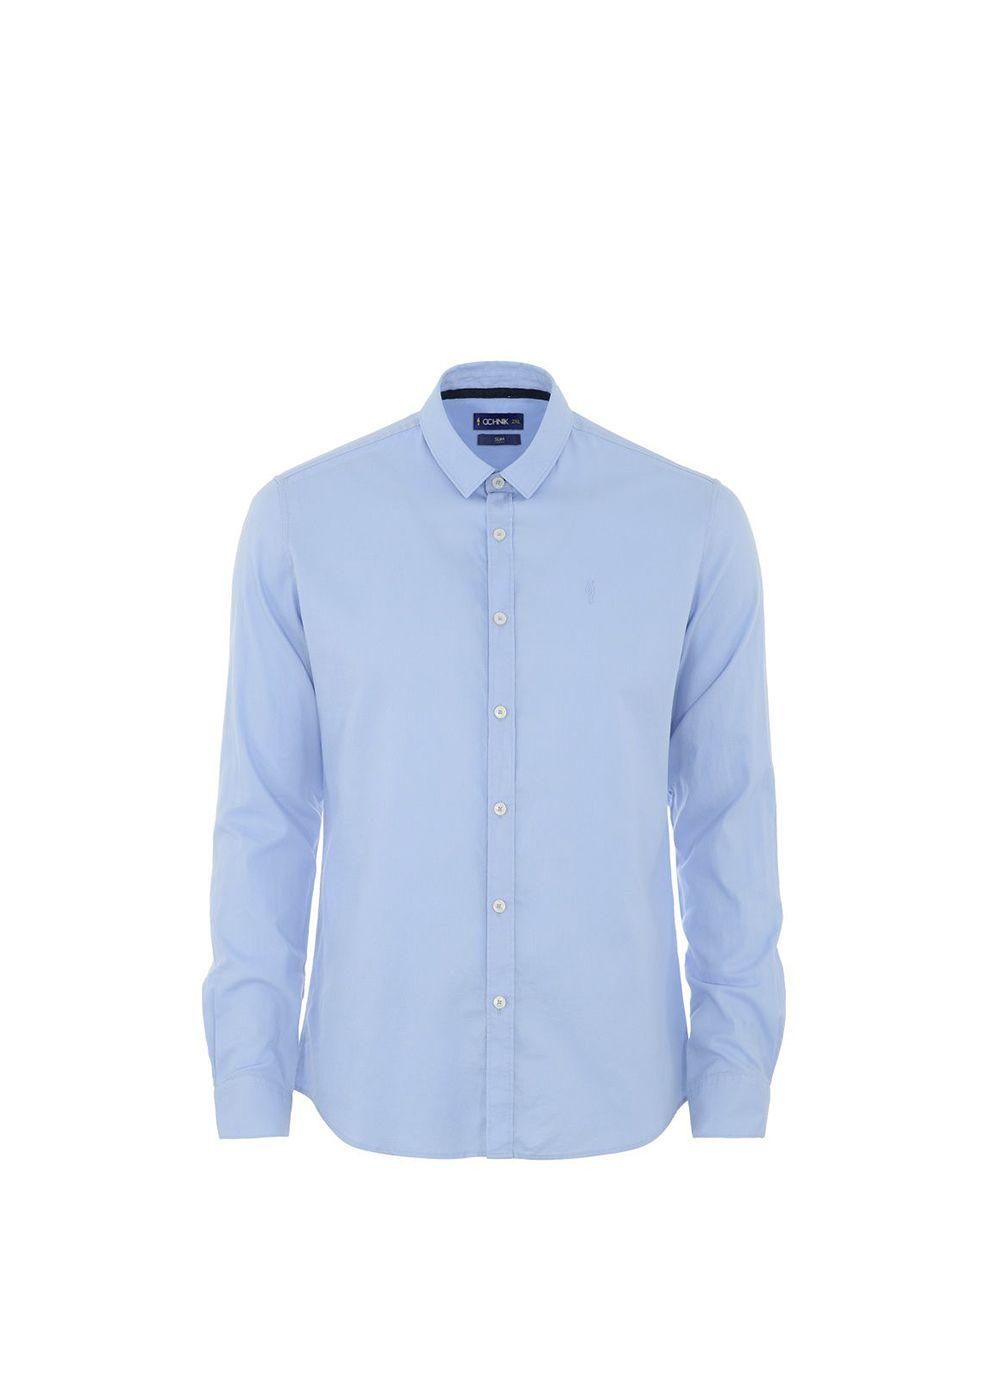 Koszula męska KOSMT-0068-61(W20)